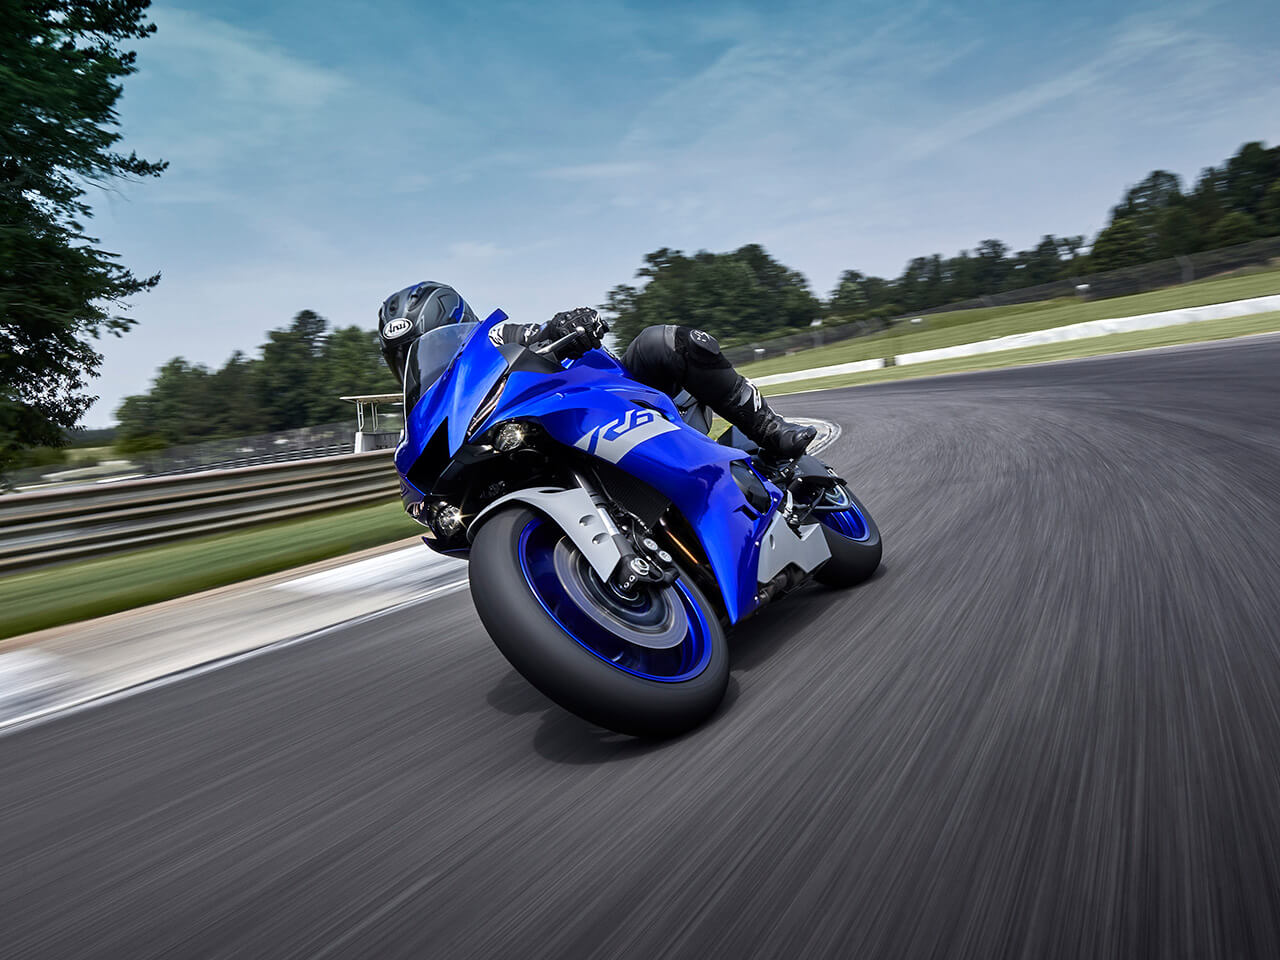 2020 Yamaha YZF-R6 Gallery 5